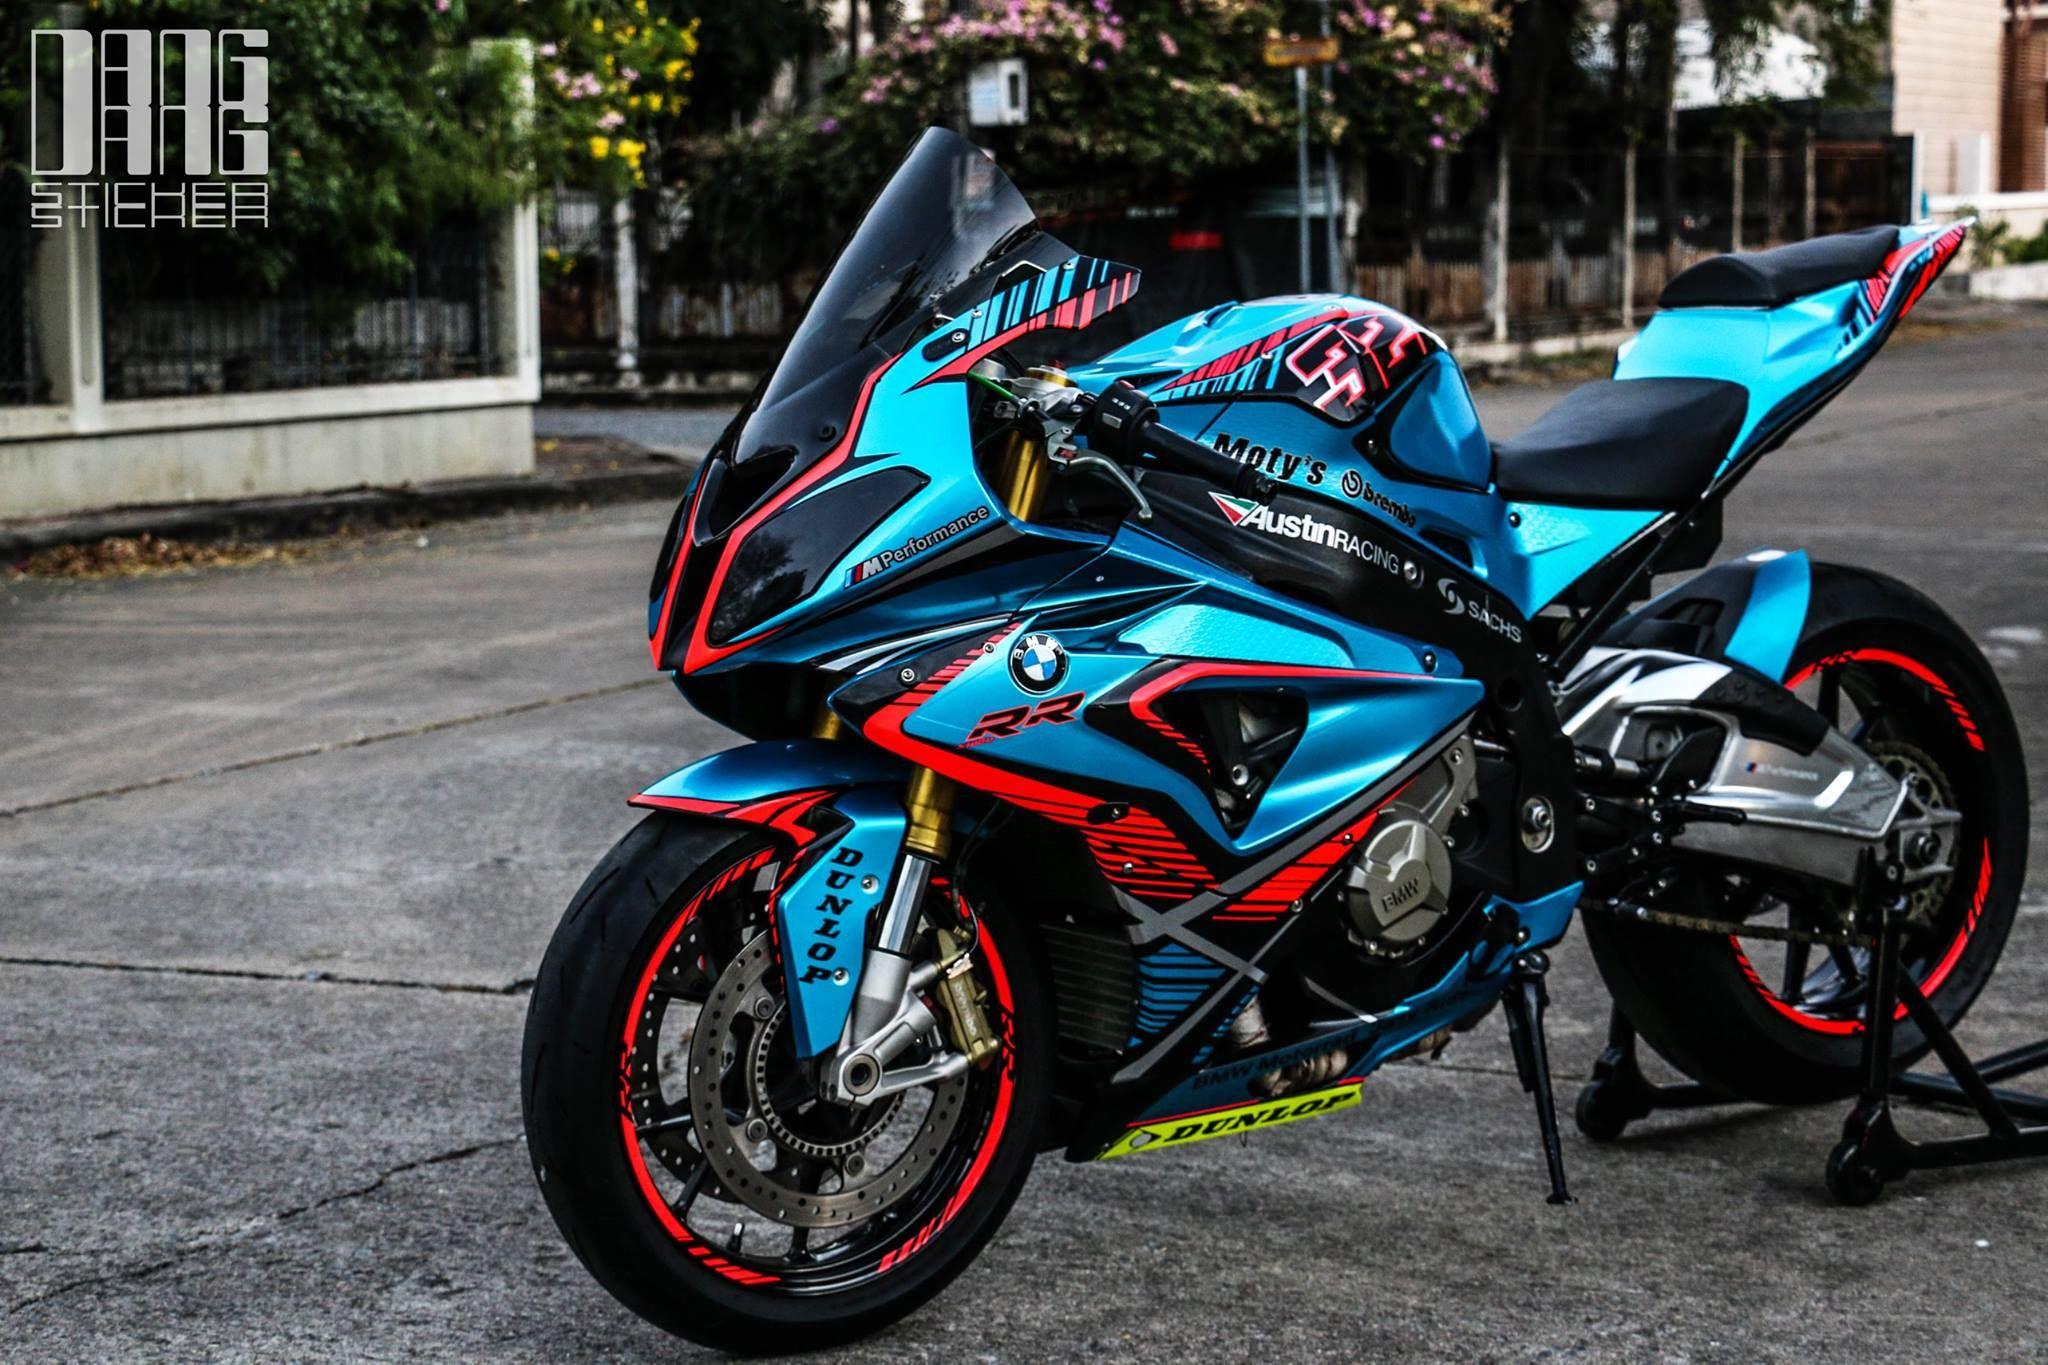 Bmw S1000rr Custom By Dang Sticker Bmw S1000rr Bike Bmw Sports Bikes Motorcycles